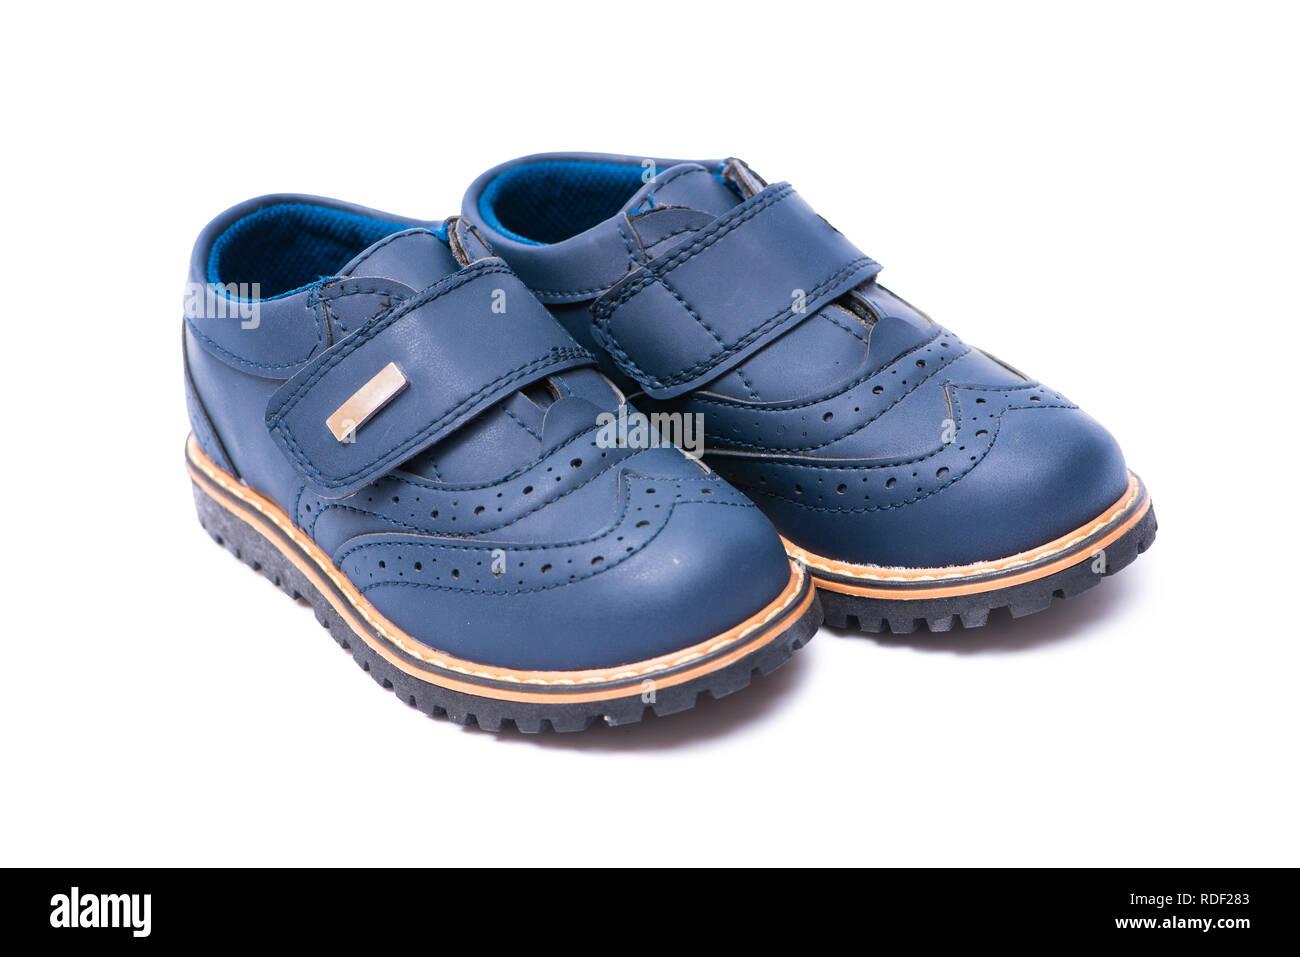 3857f7e28204 Blue baby shoes isolated on white background Stock Photo  232056387 ...